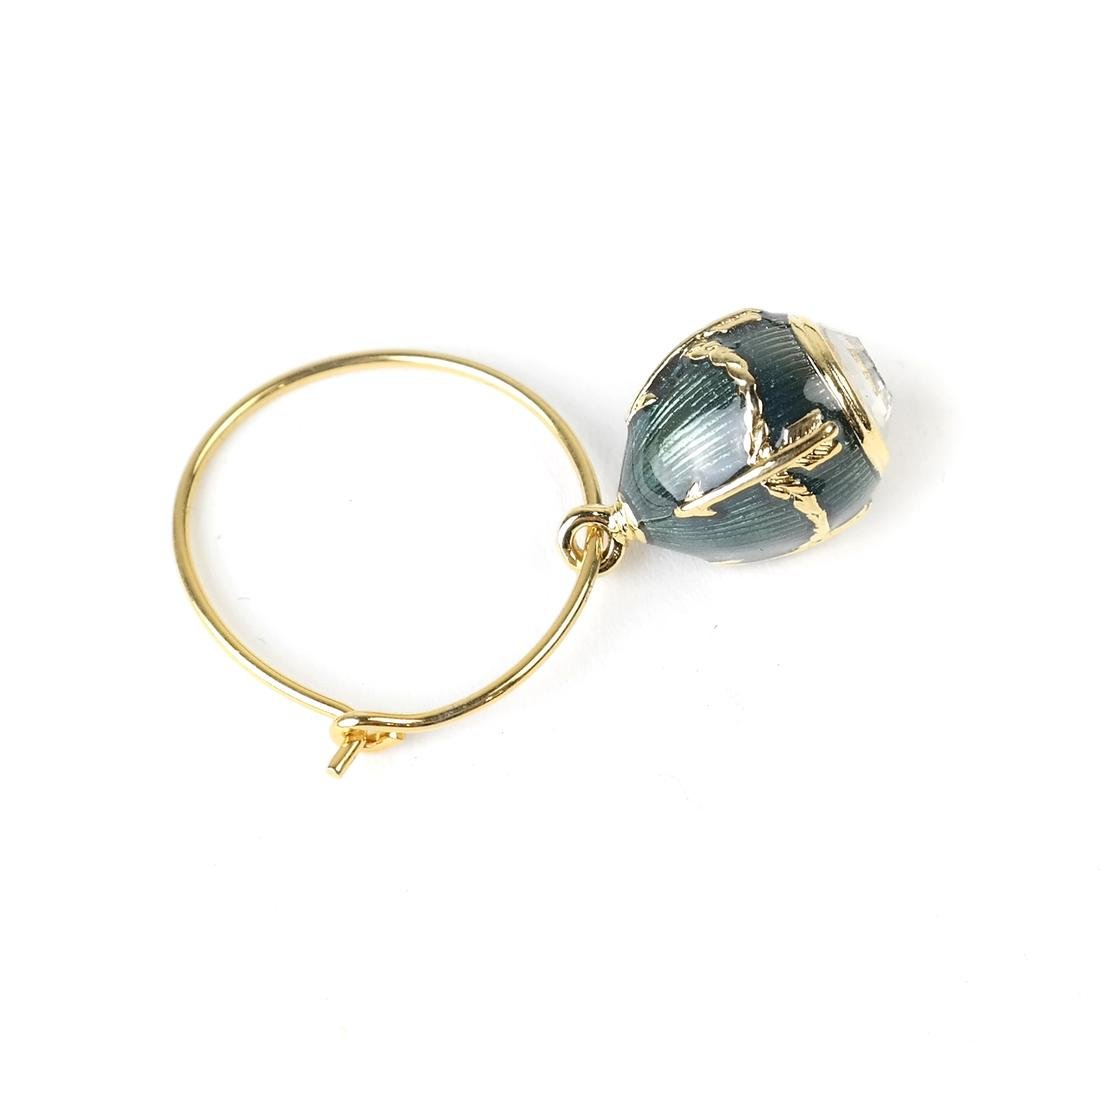 Six Wine Glass Charms, Fabergé - 7